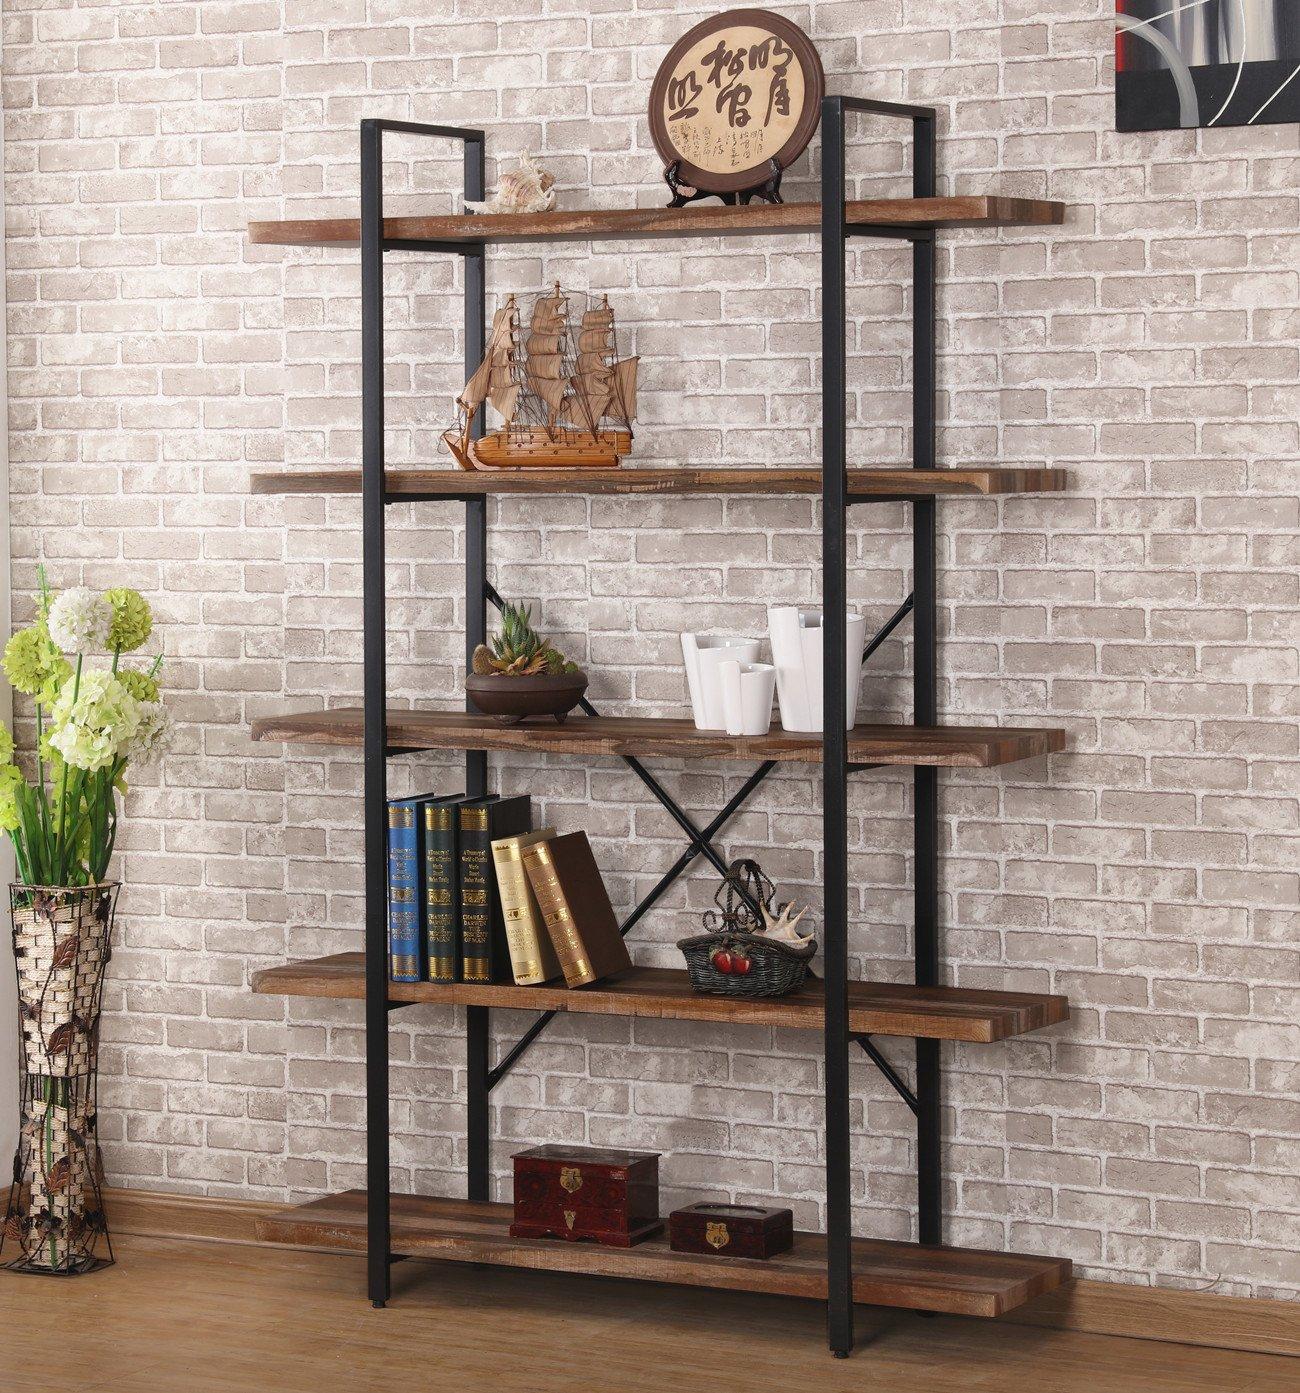 Amazon com ok furniture 5 shelf industrial style bookcase and shelves free standing storage shelf units kitchen dining